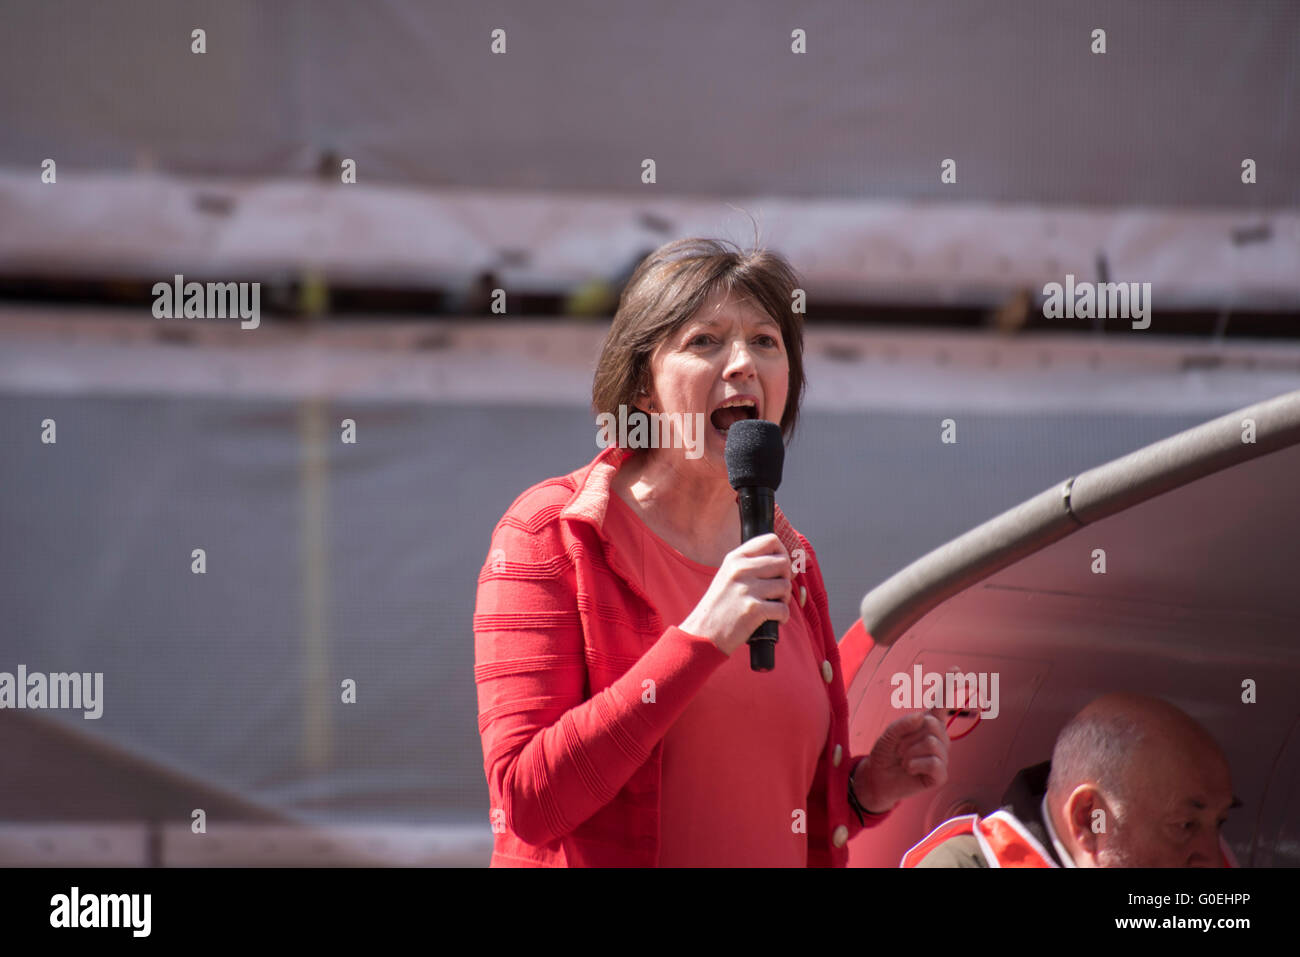 London, United KIngdom. 1st May 2016. Frances O'Grady the General Secretary of the British Trades Union Congress - Stock Image